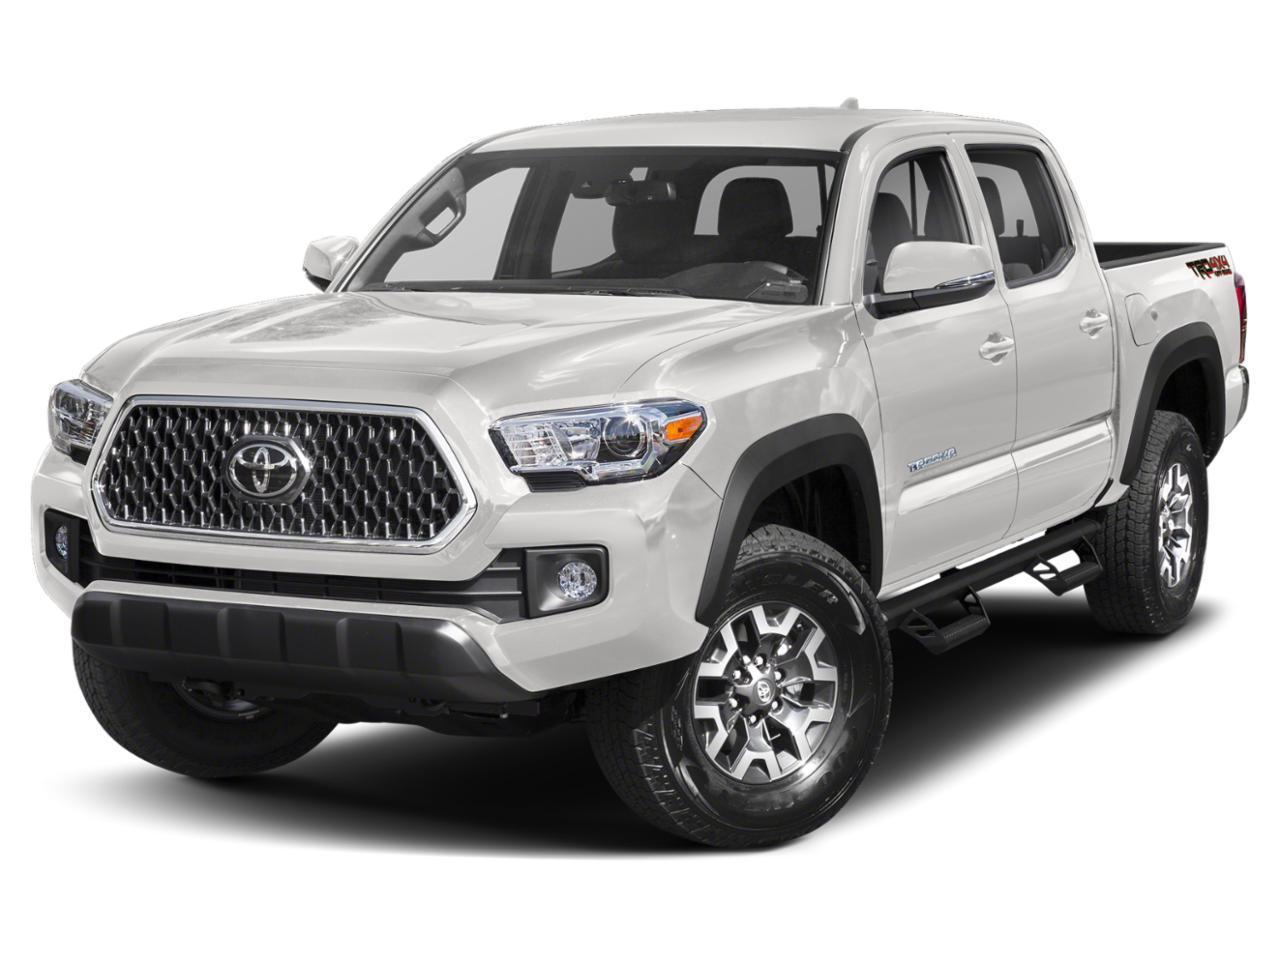 2019 Toyota Tacoma 4WD Vehicle Photo in Novato, CA 94945